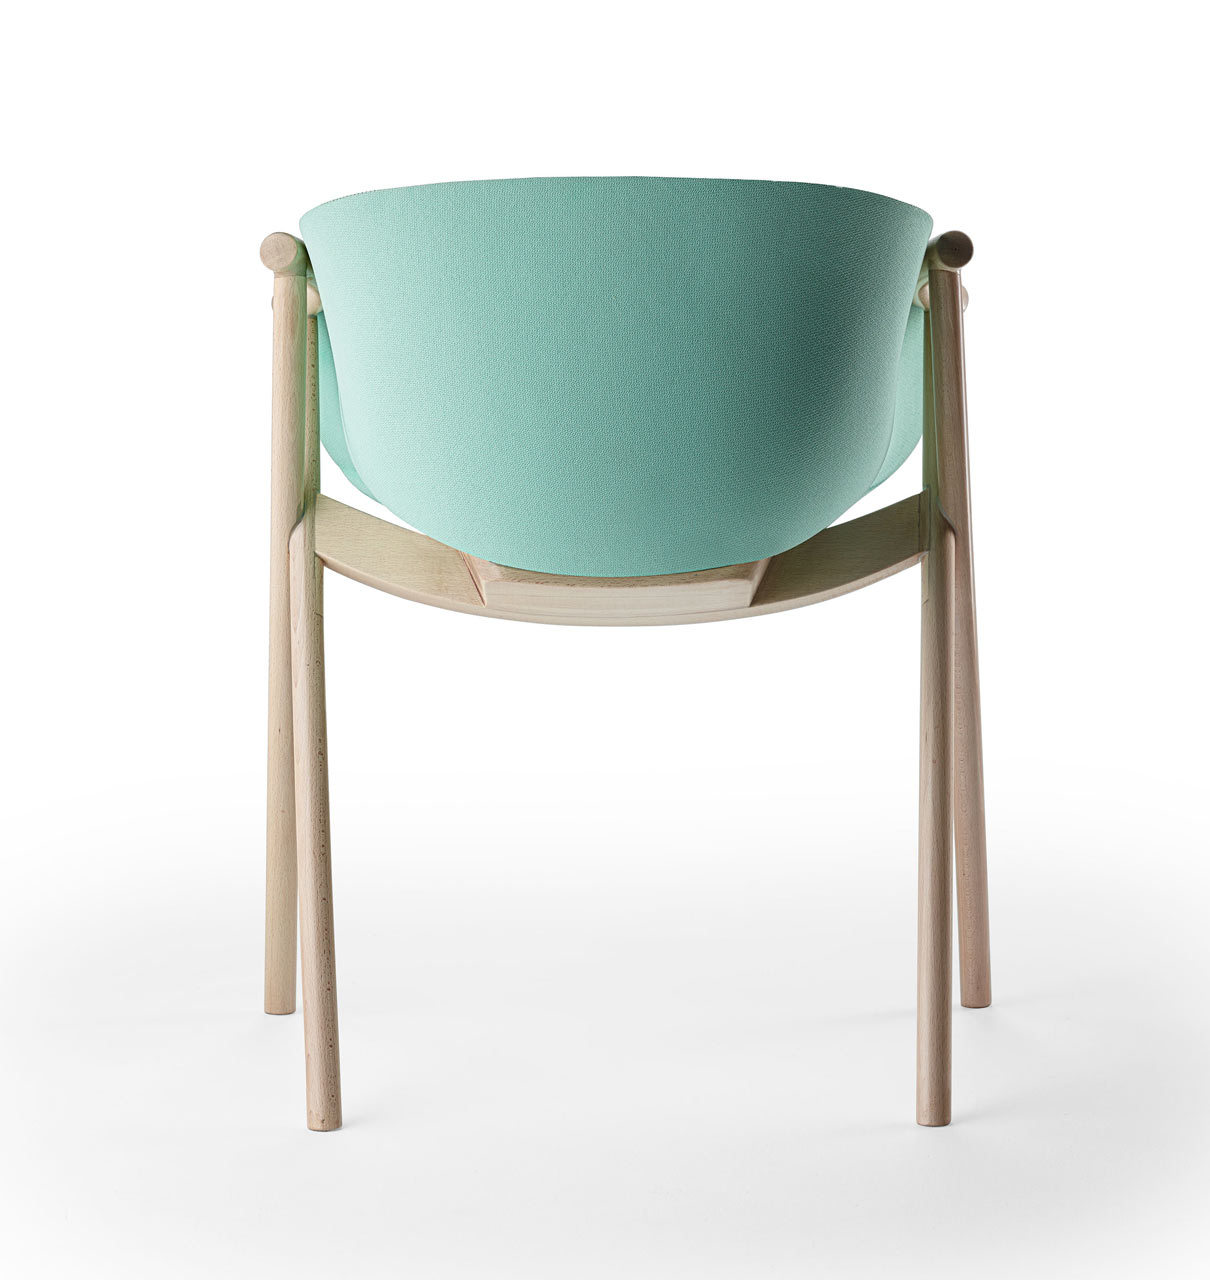 Bai-Chair-Ondarreta-Ander-Lizaso-4